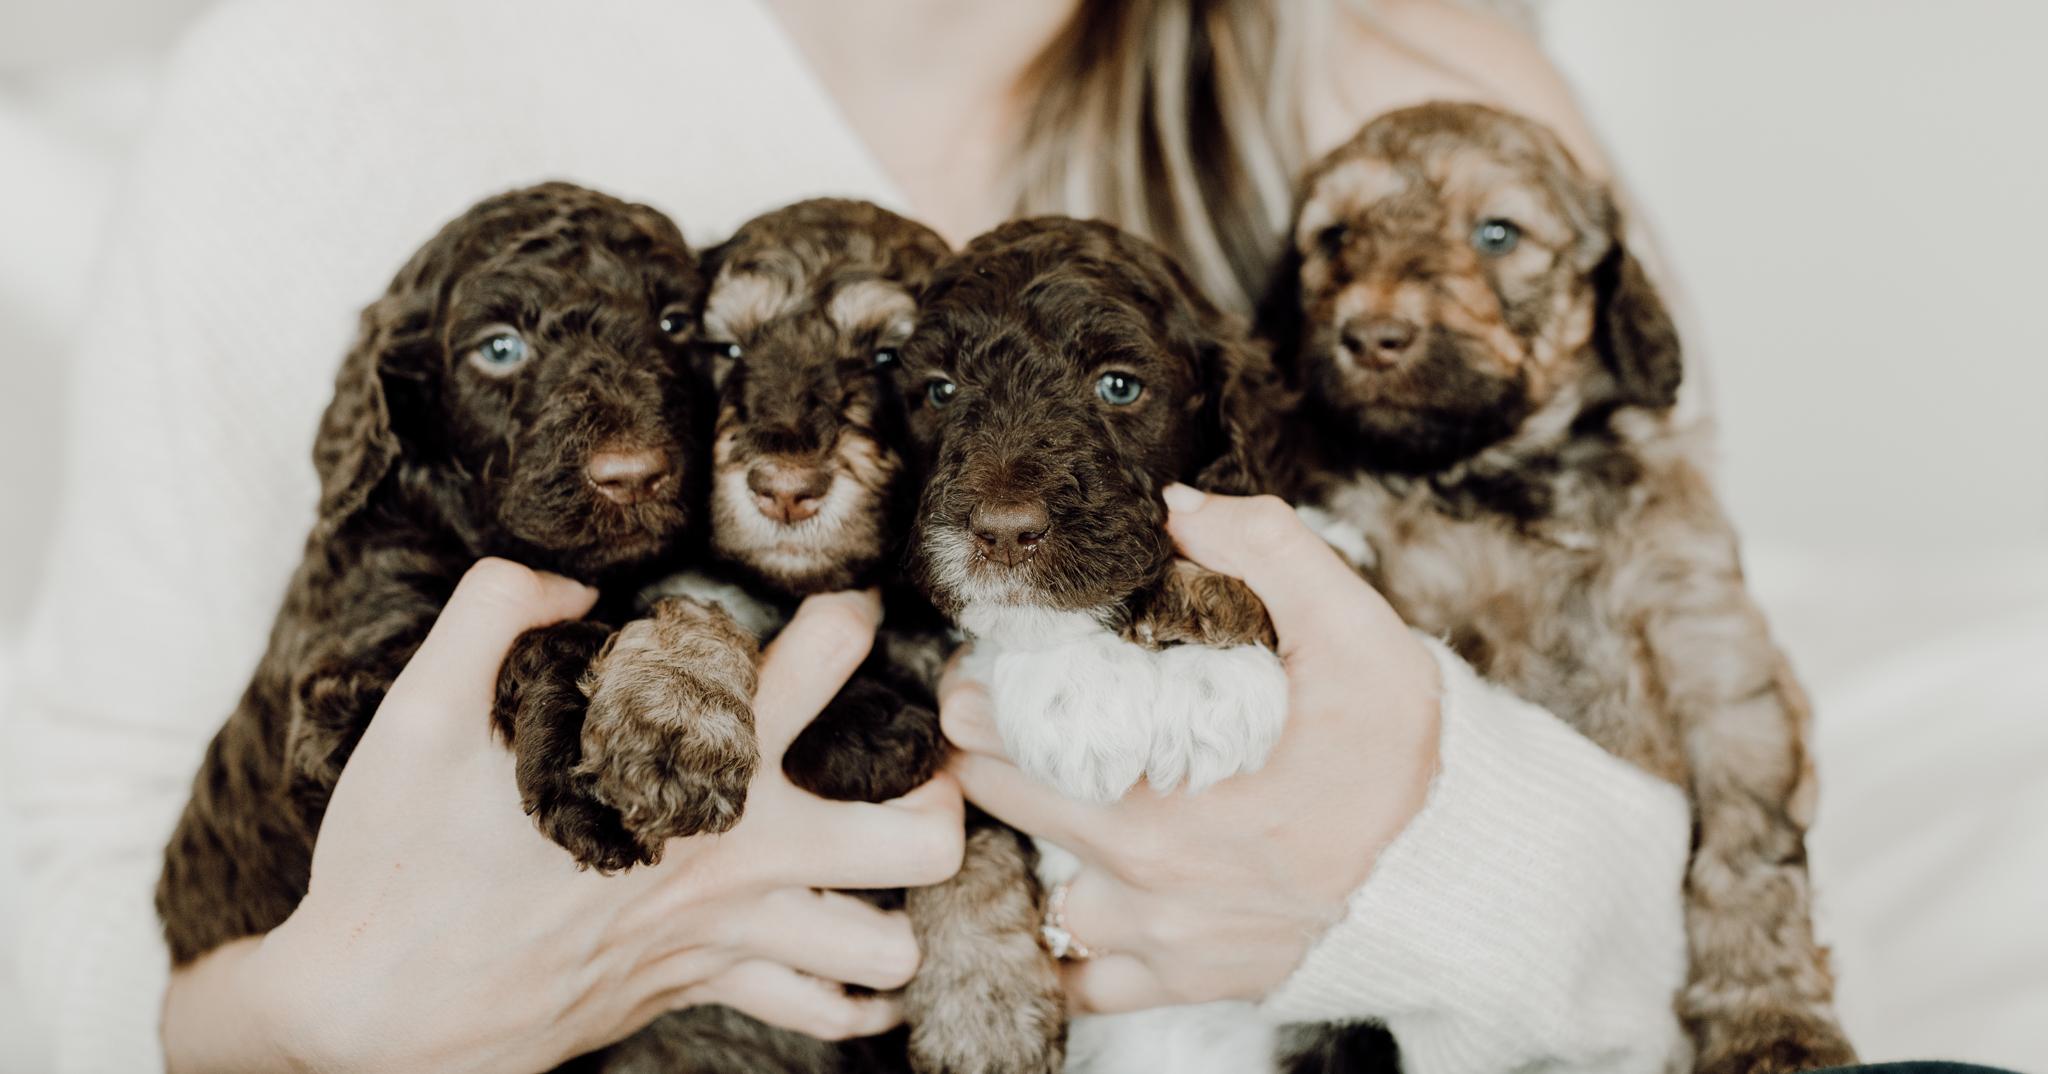 houston-wedding-photographer-in-home-maternity-session-puppies- Houston Wedding Photographer -Kristen Giles Photography-62.jpg